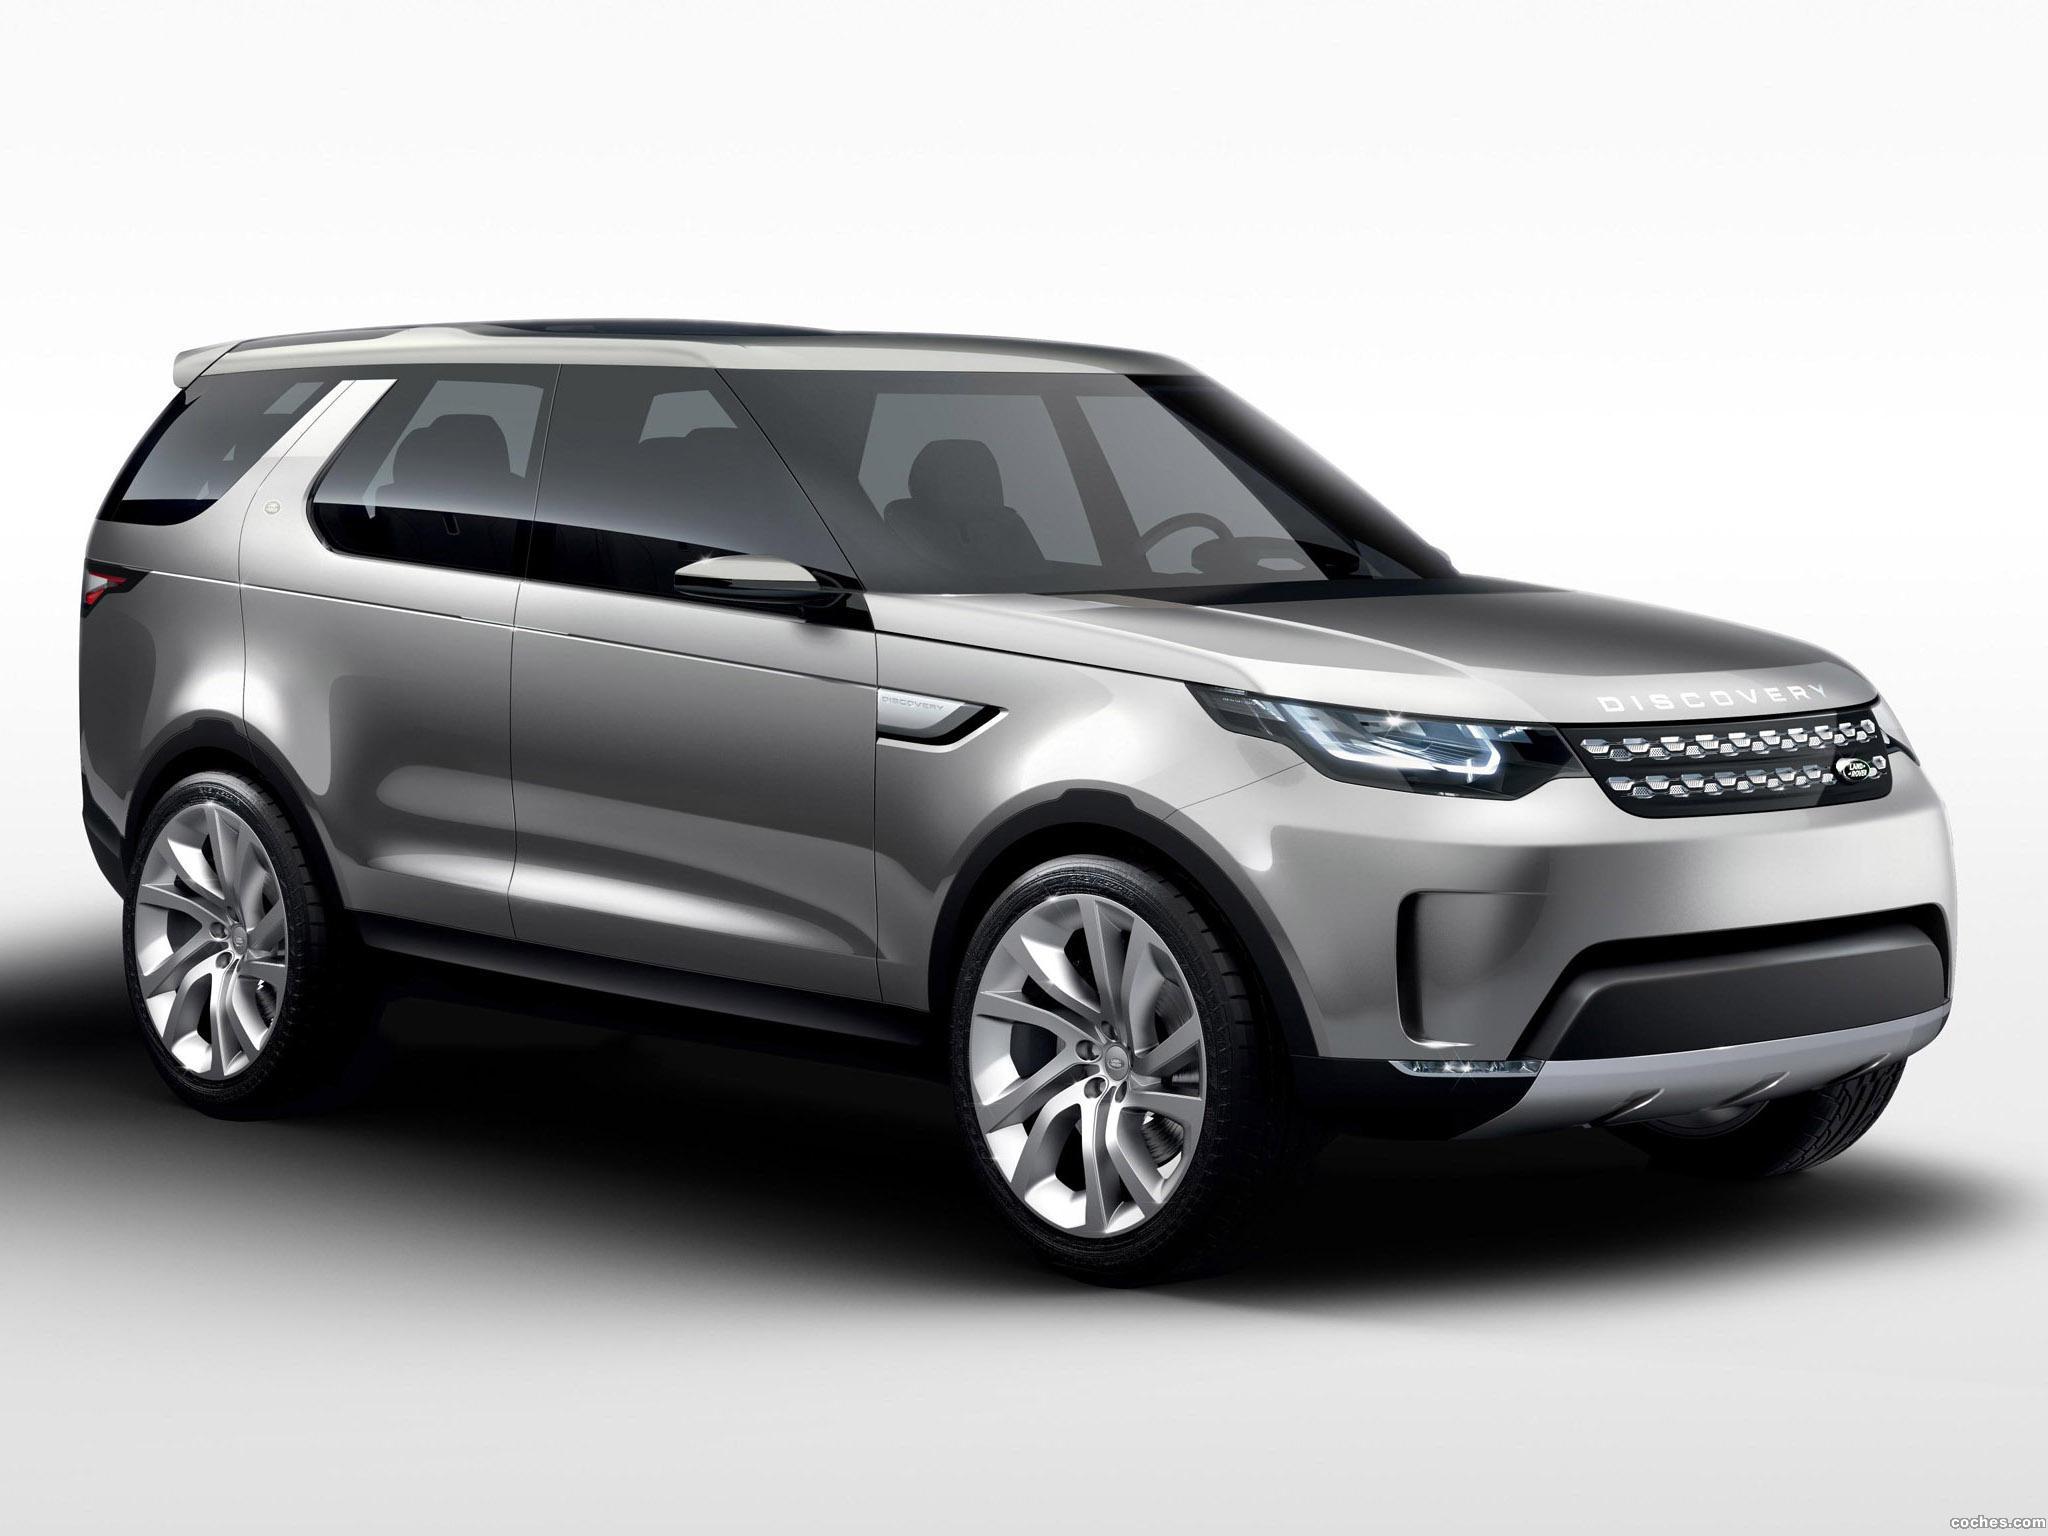 Foto 0 de Land Rover Discovery Vision Concept 2014